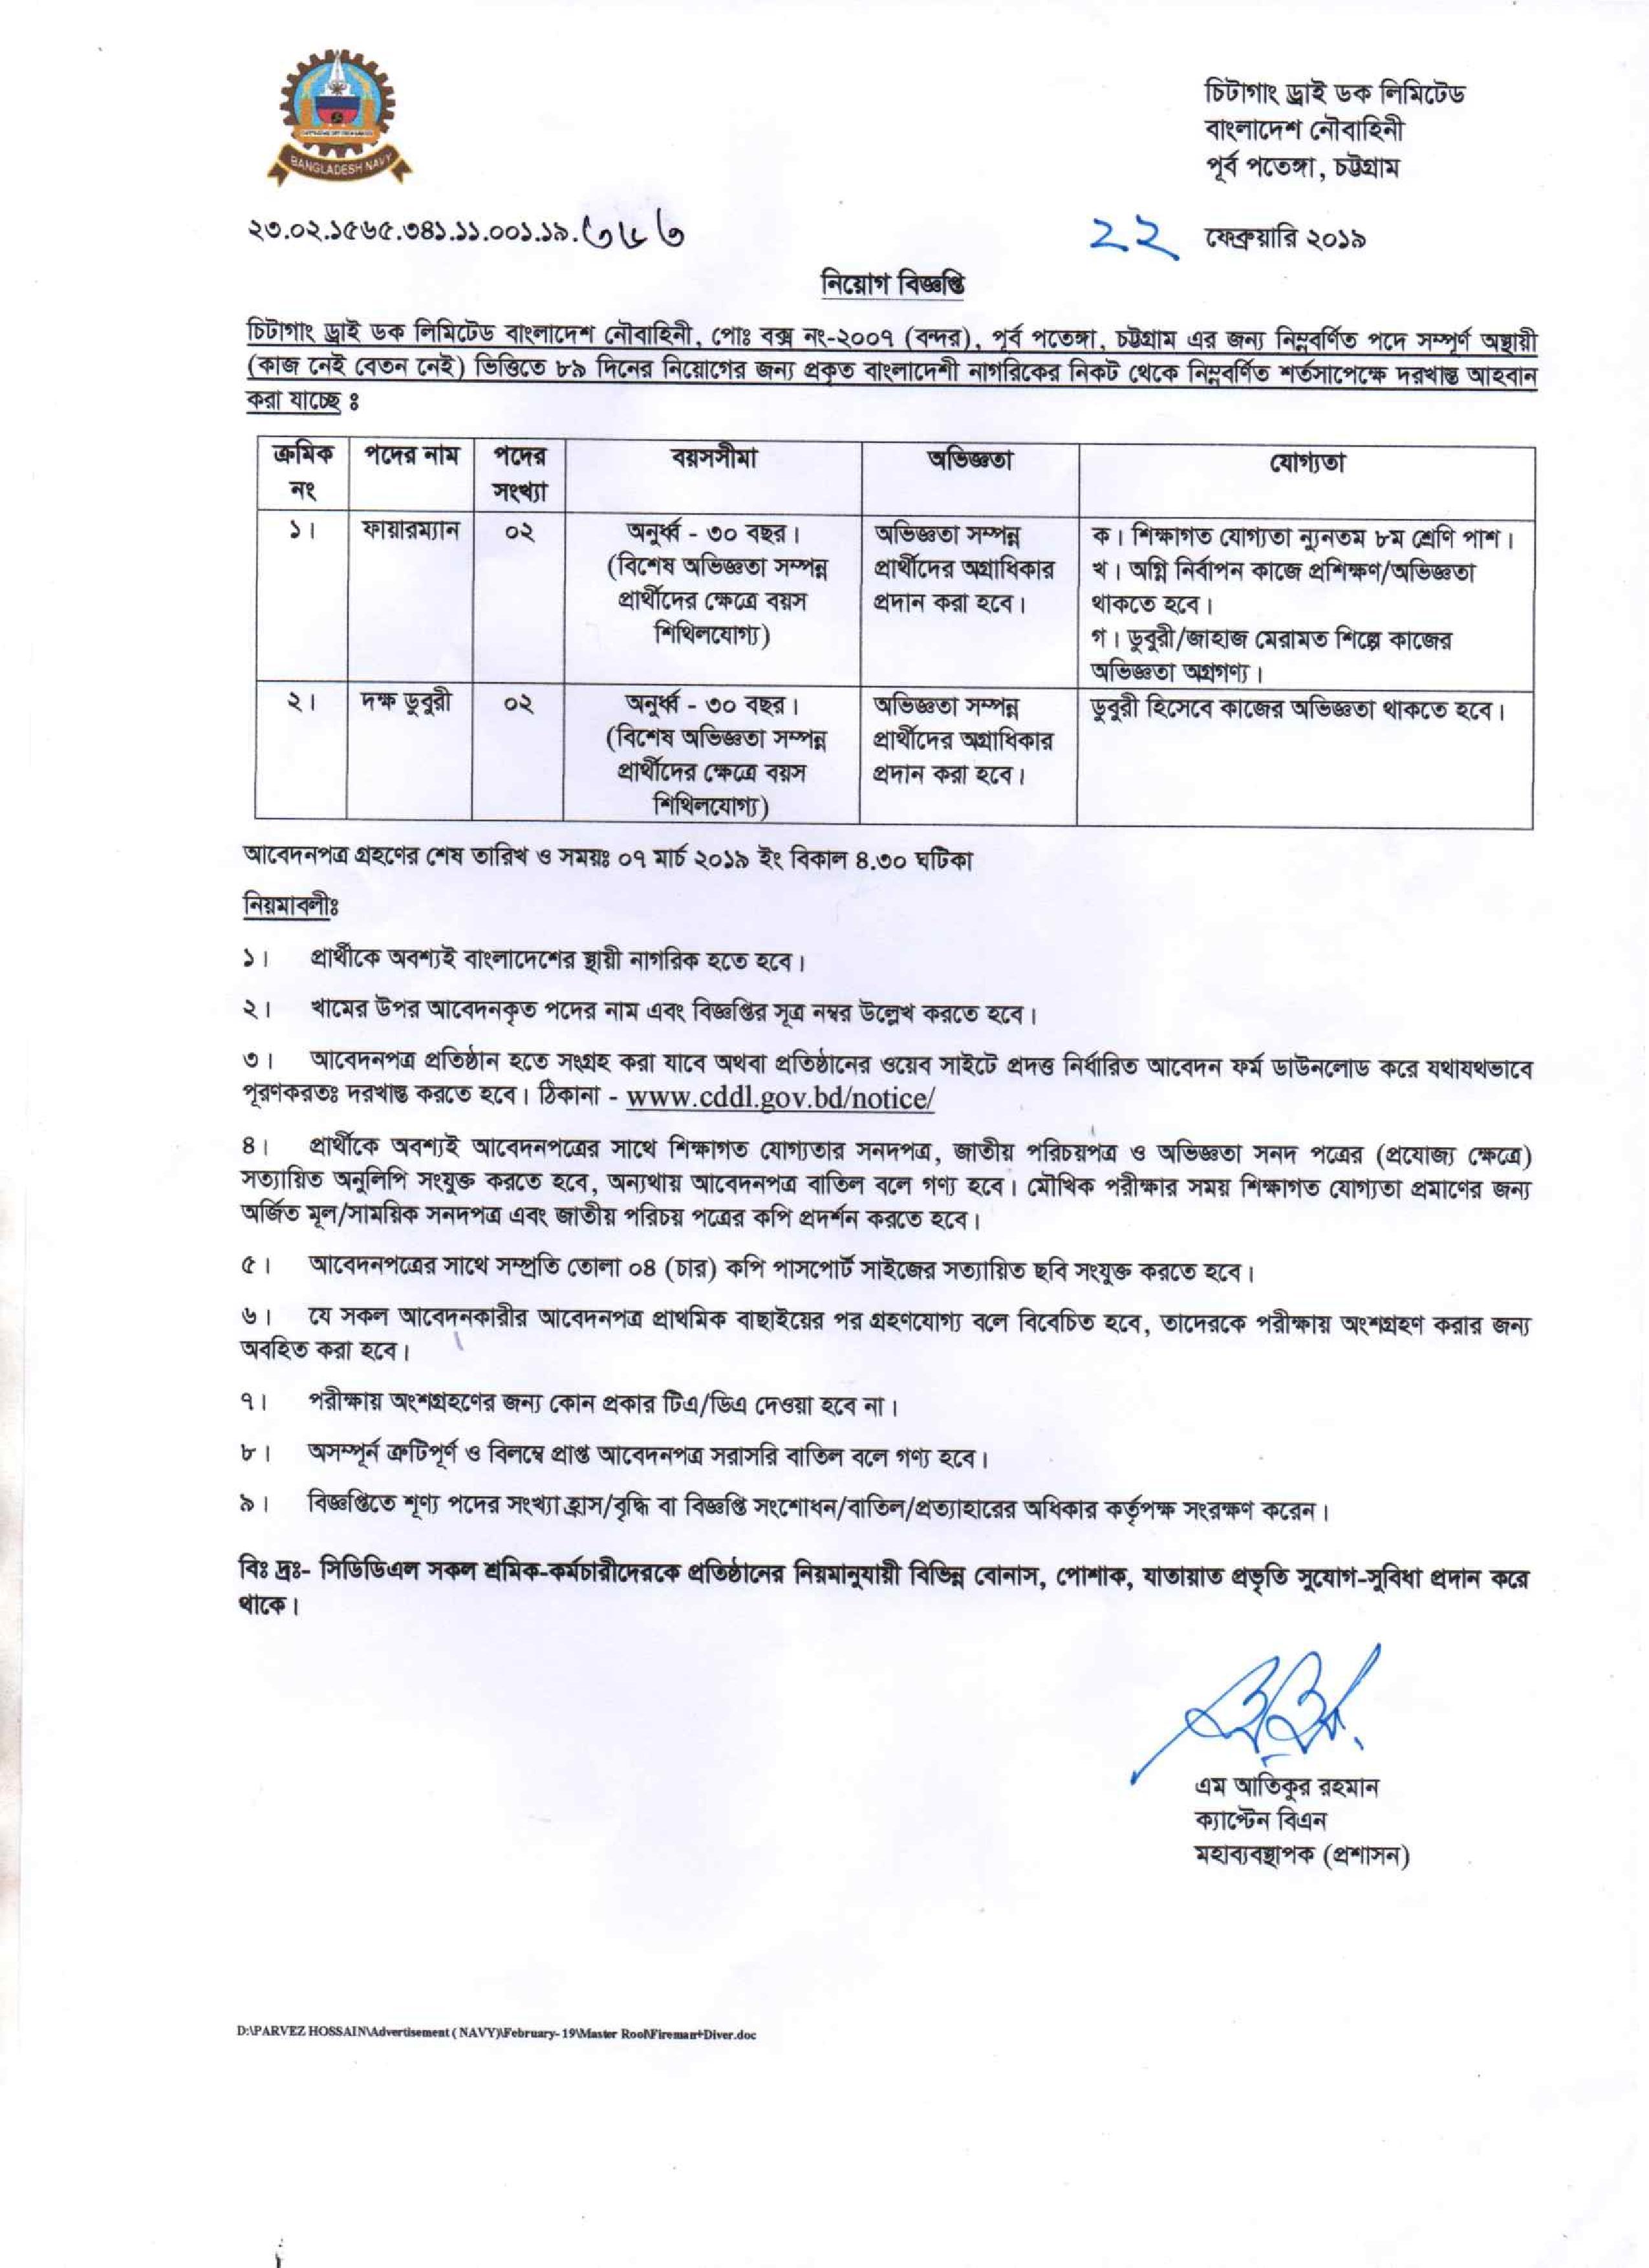 Chittagong Dry Dock Limited Job Circular 2019, CDDL Recruitment, চট্টগ্রাম ড্রাই ডক লিমিটেড নিয়োগ বিজ্ঞপ্তি ২০১৯, সরকারি চাকরি, Govt. Job, cddl.gov.bd